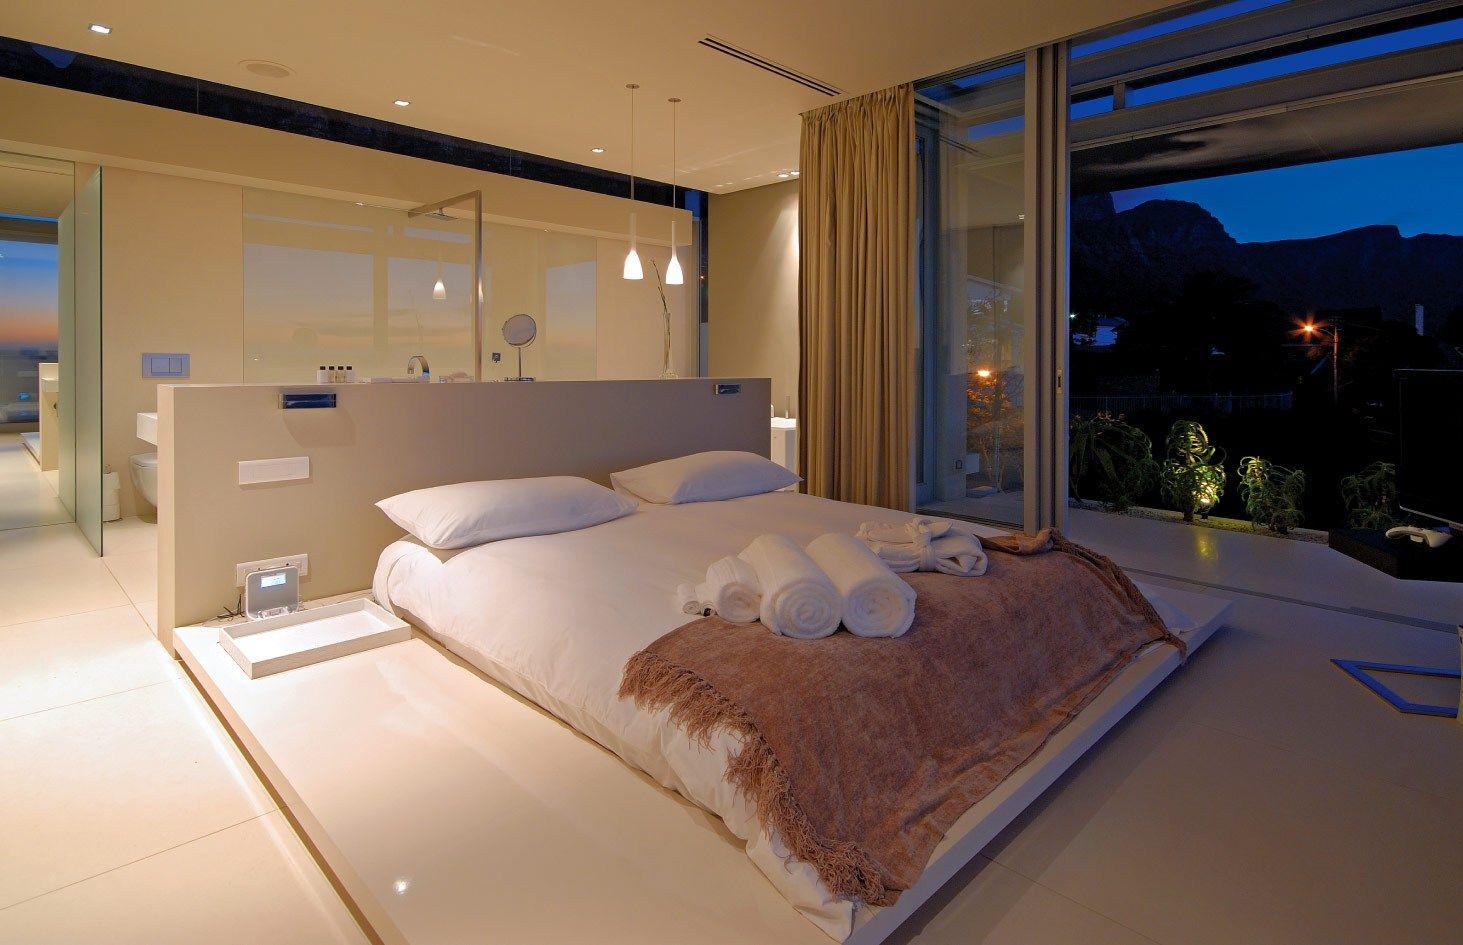 Bedroom Bathroom Interior Ultramodern House Design